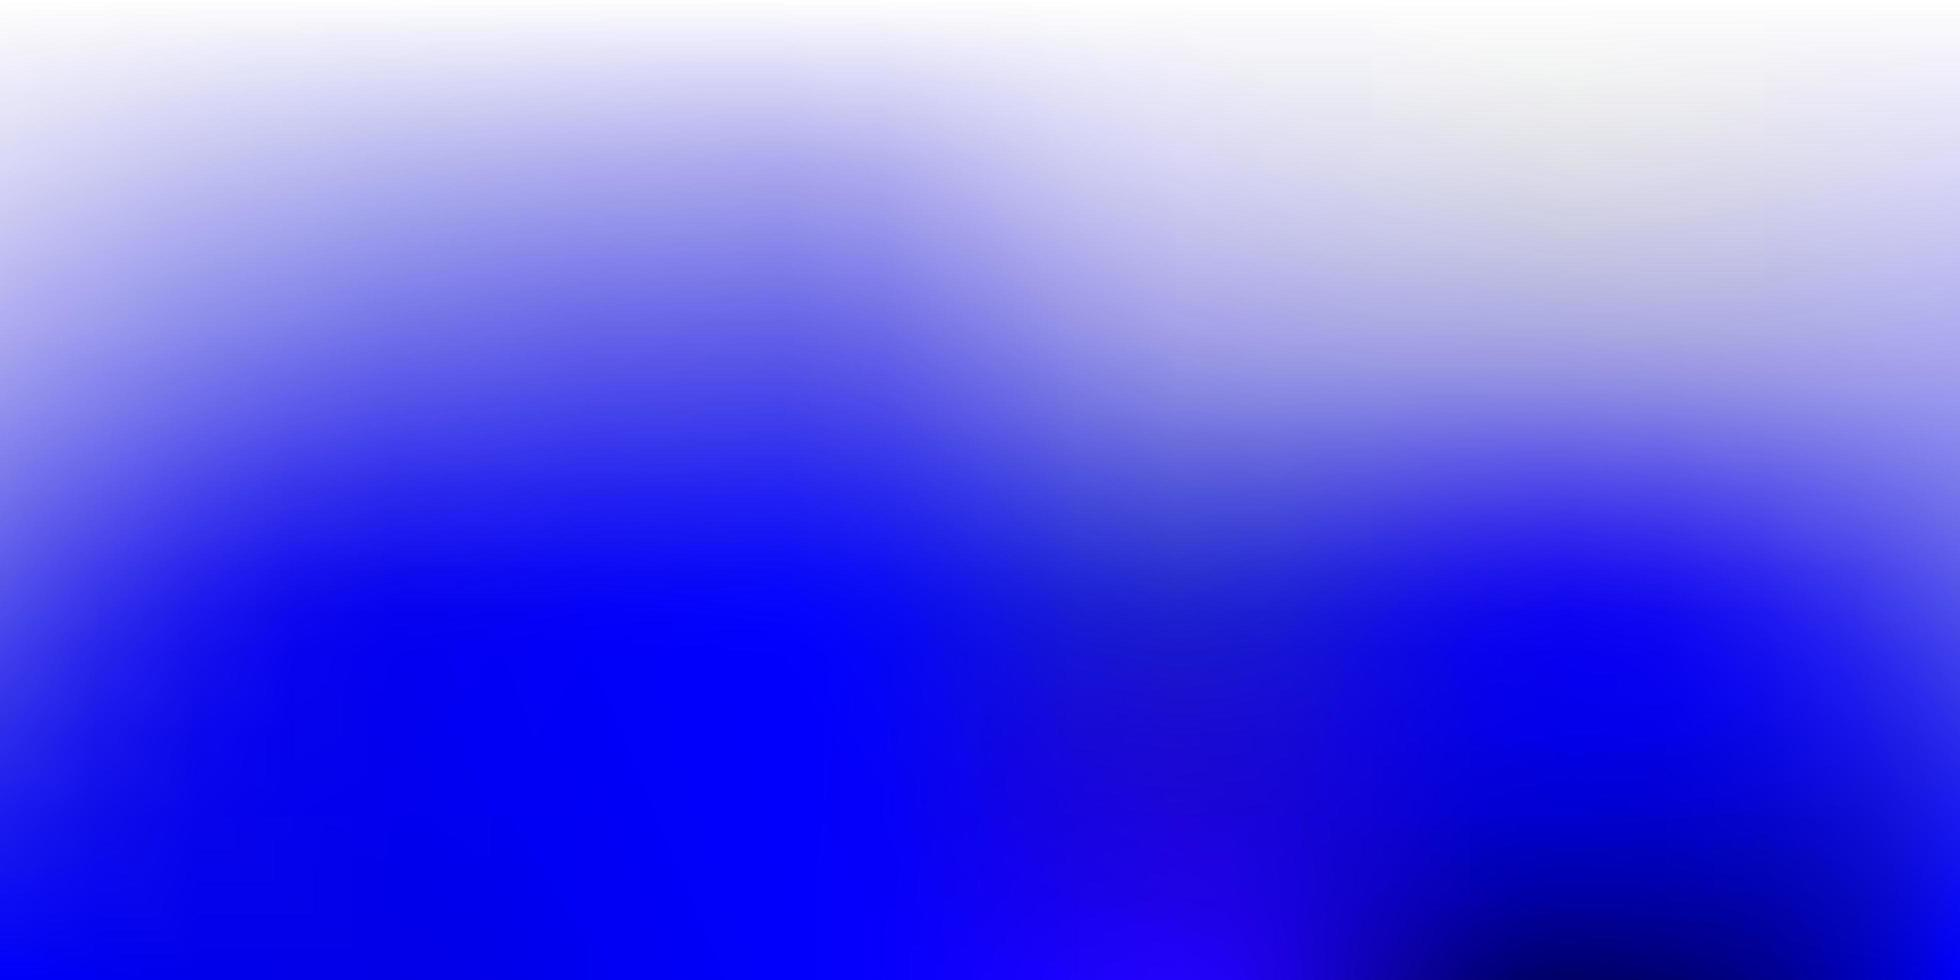 cenário de desfoque de vetor azul escuro.